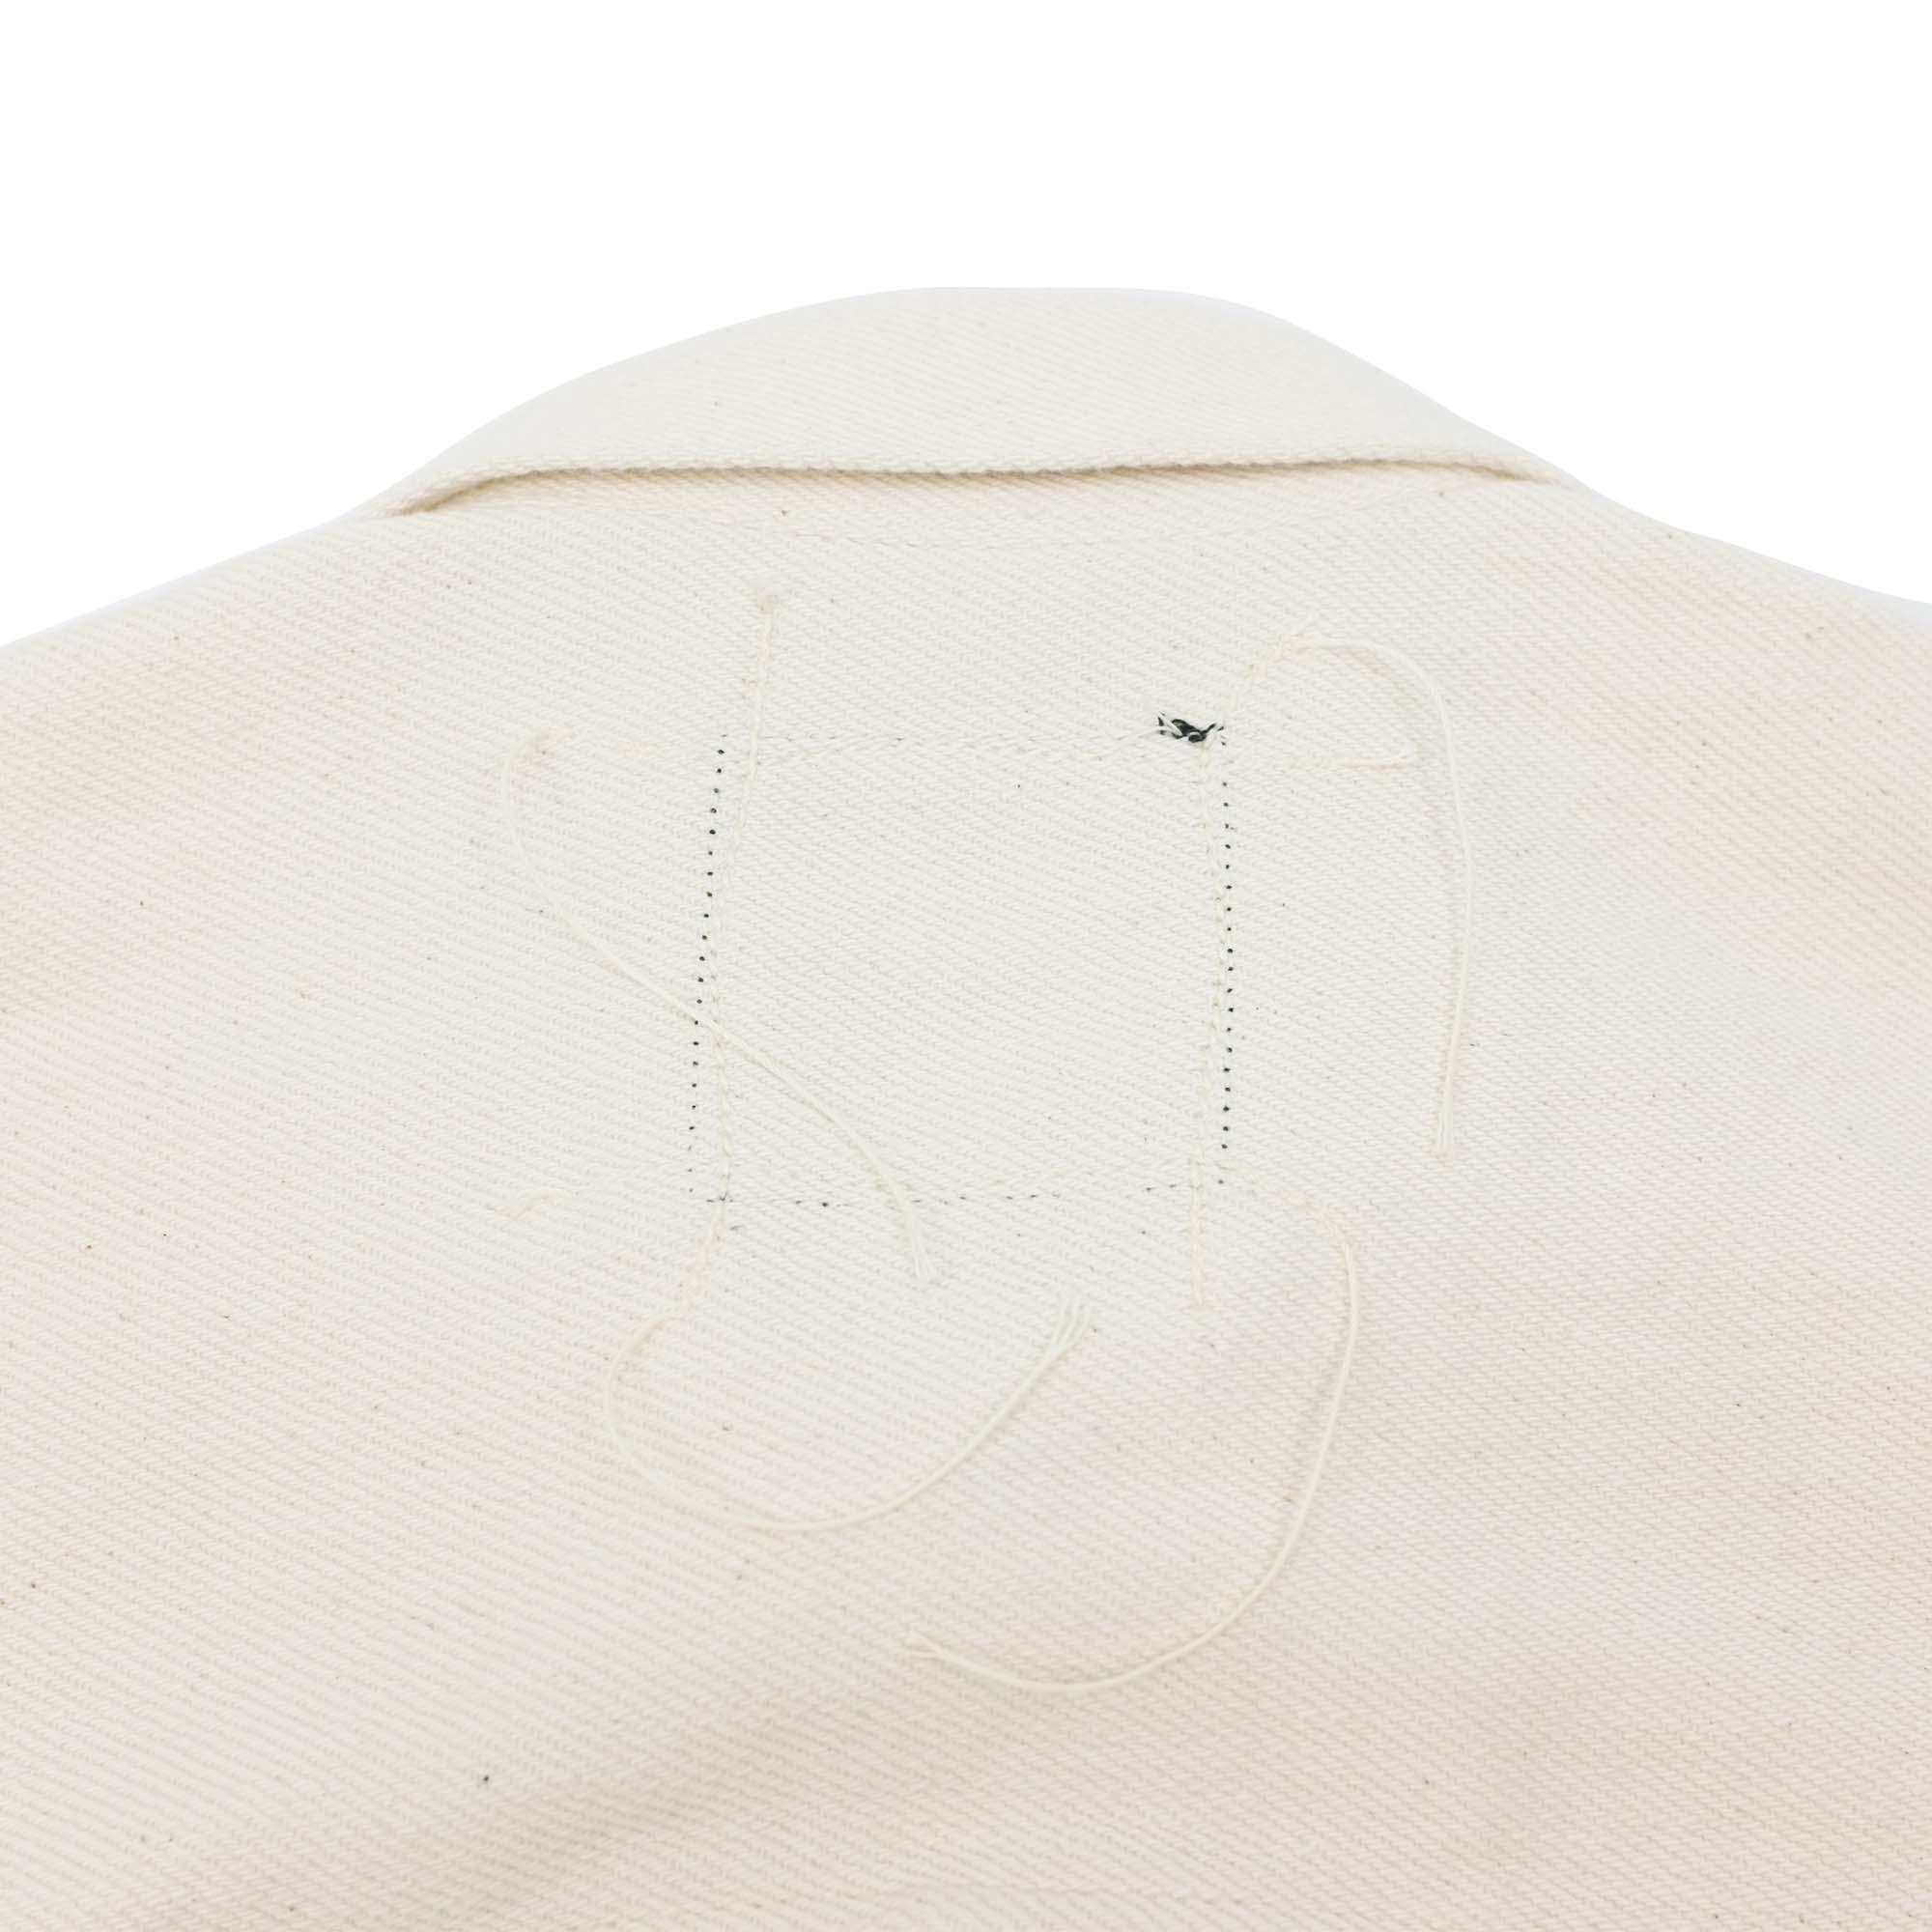 Loose Denim Big Jacket One Wash Off White 10